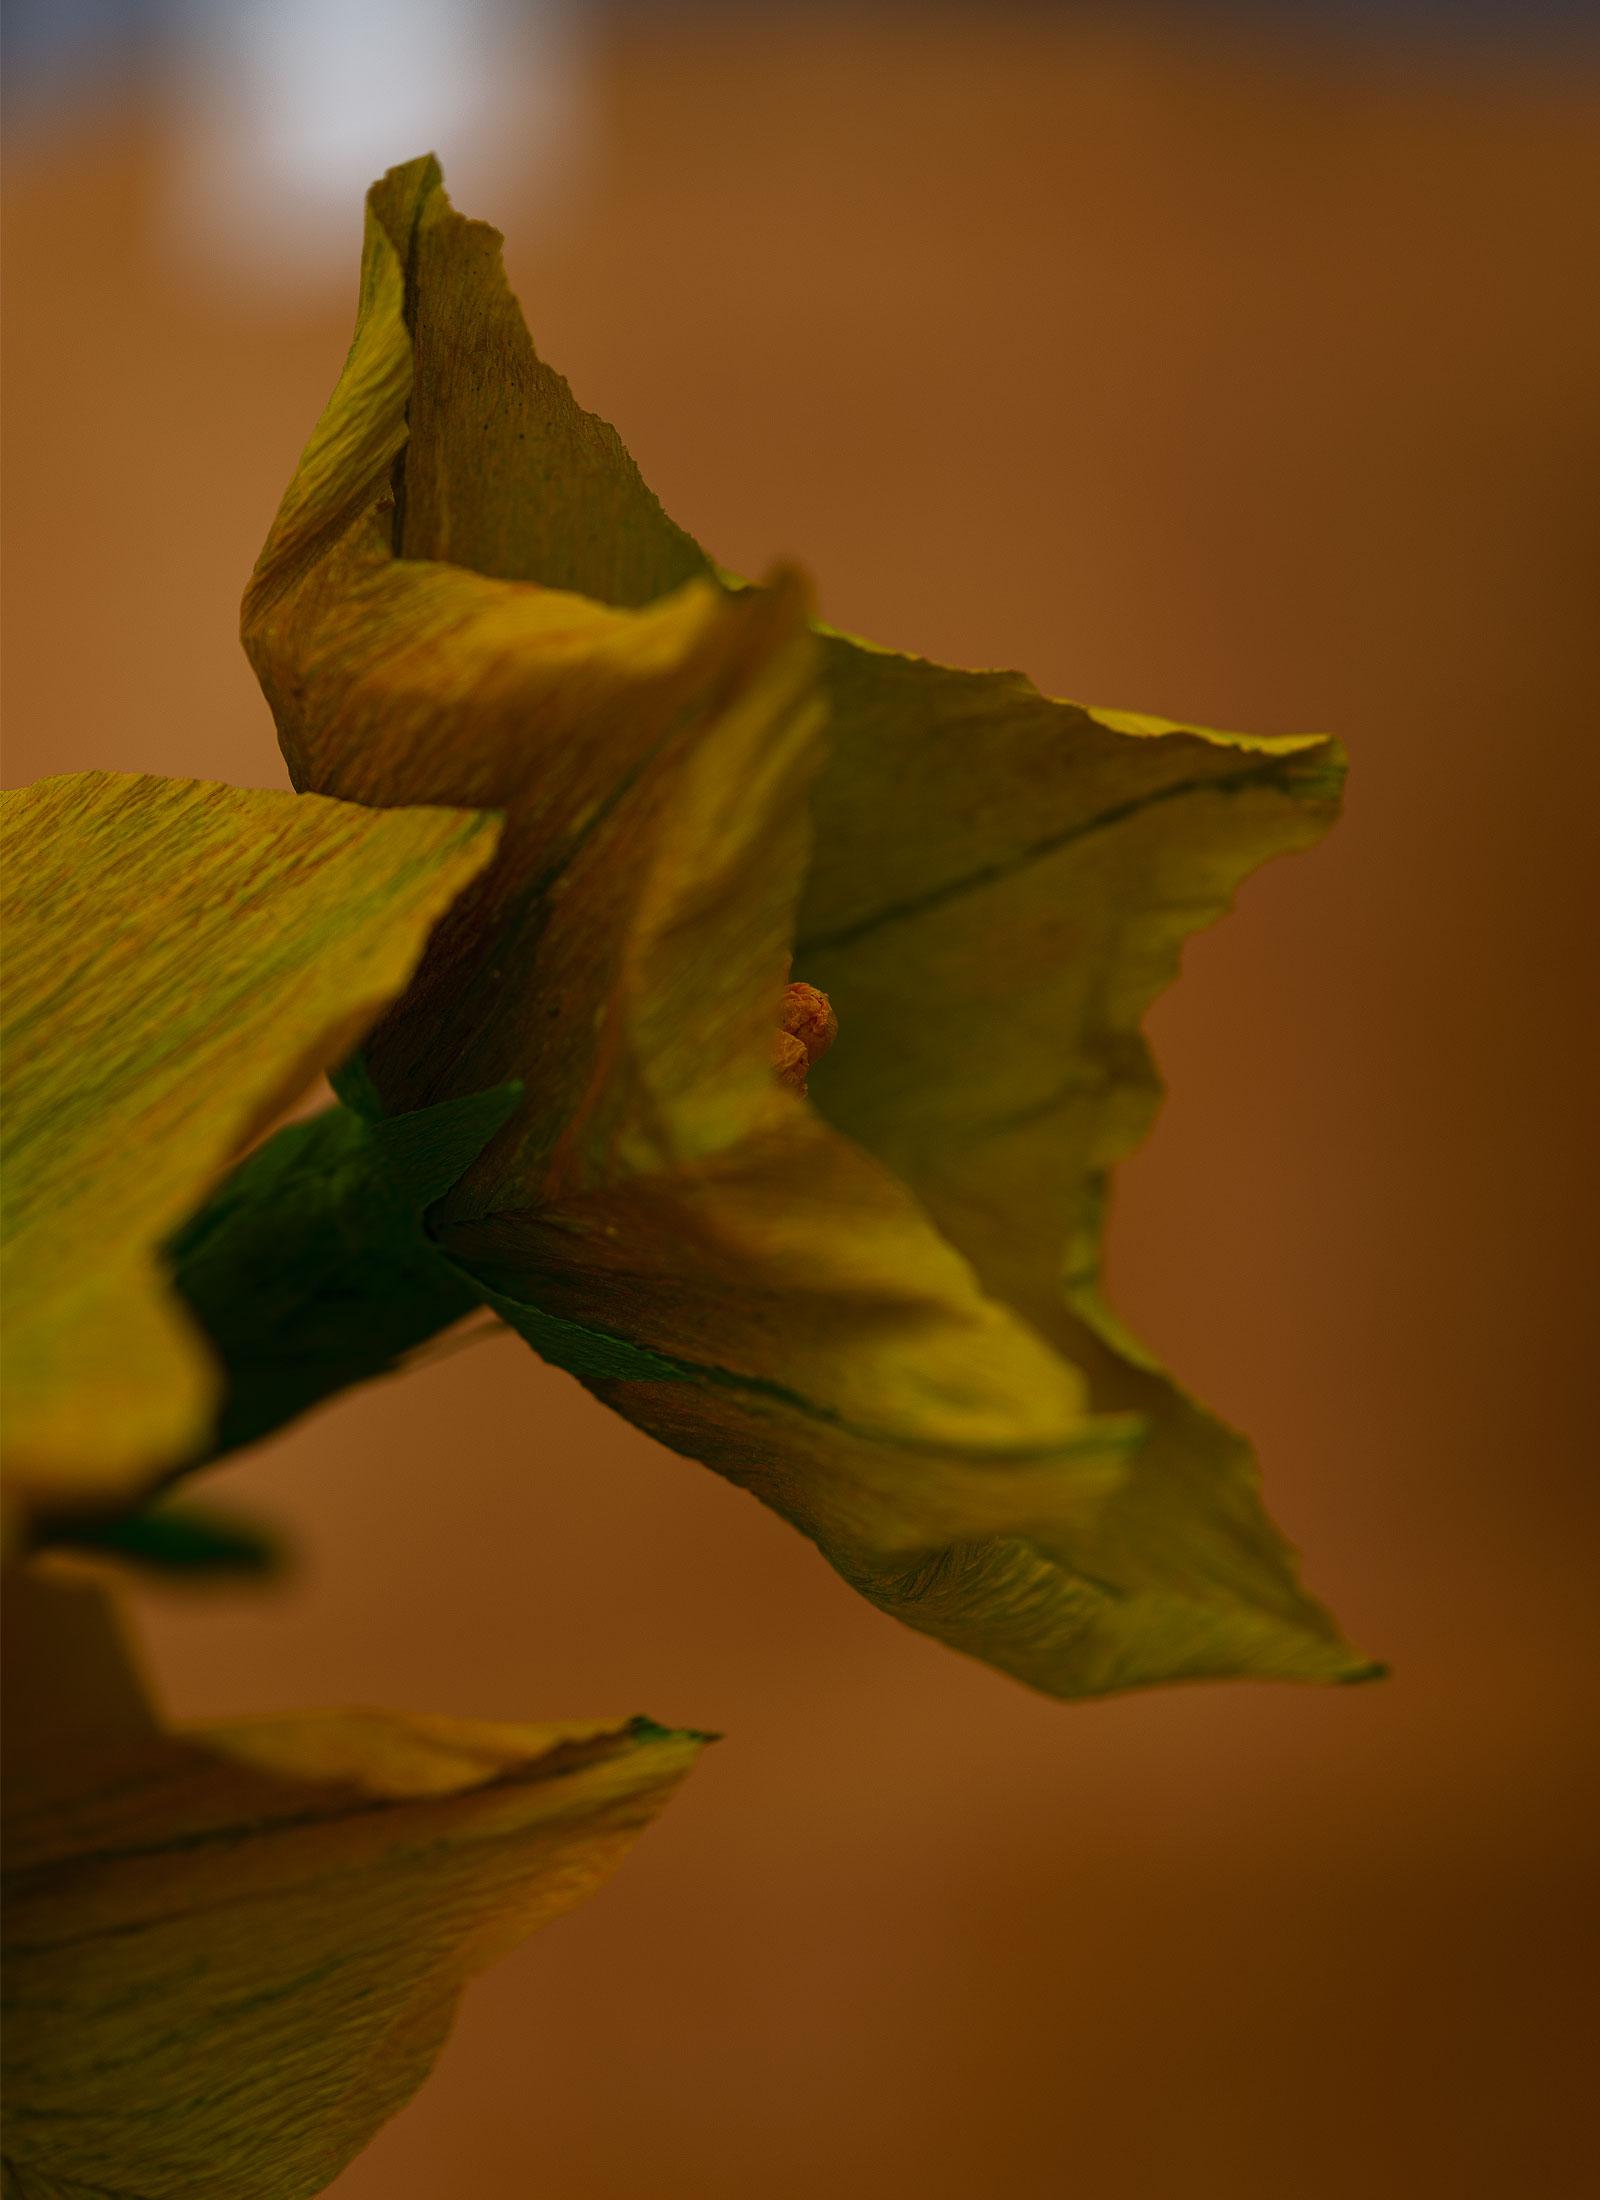 flor-zapallo-perfil-estudio-como